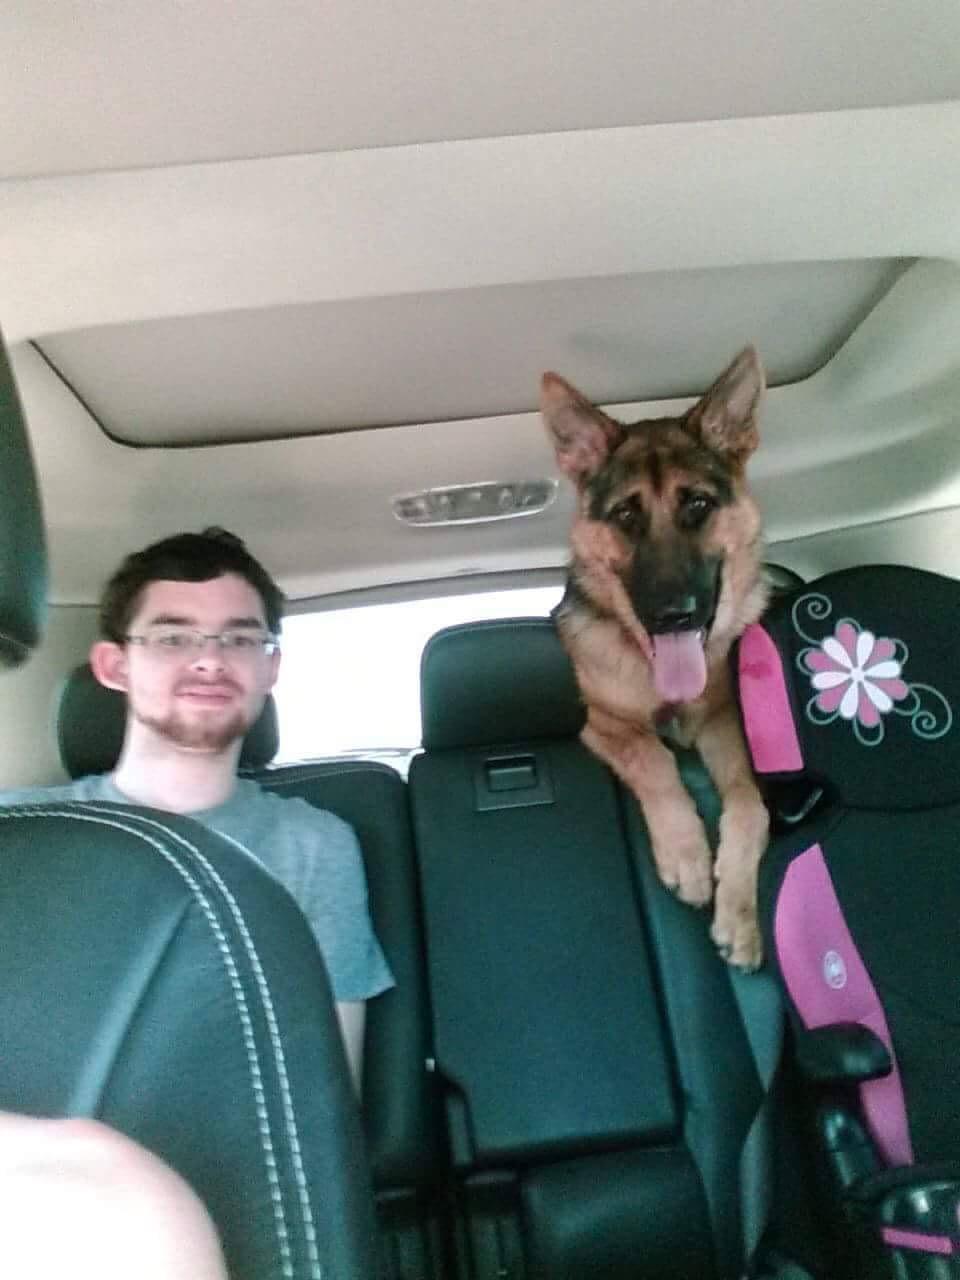 Puppy rides in car